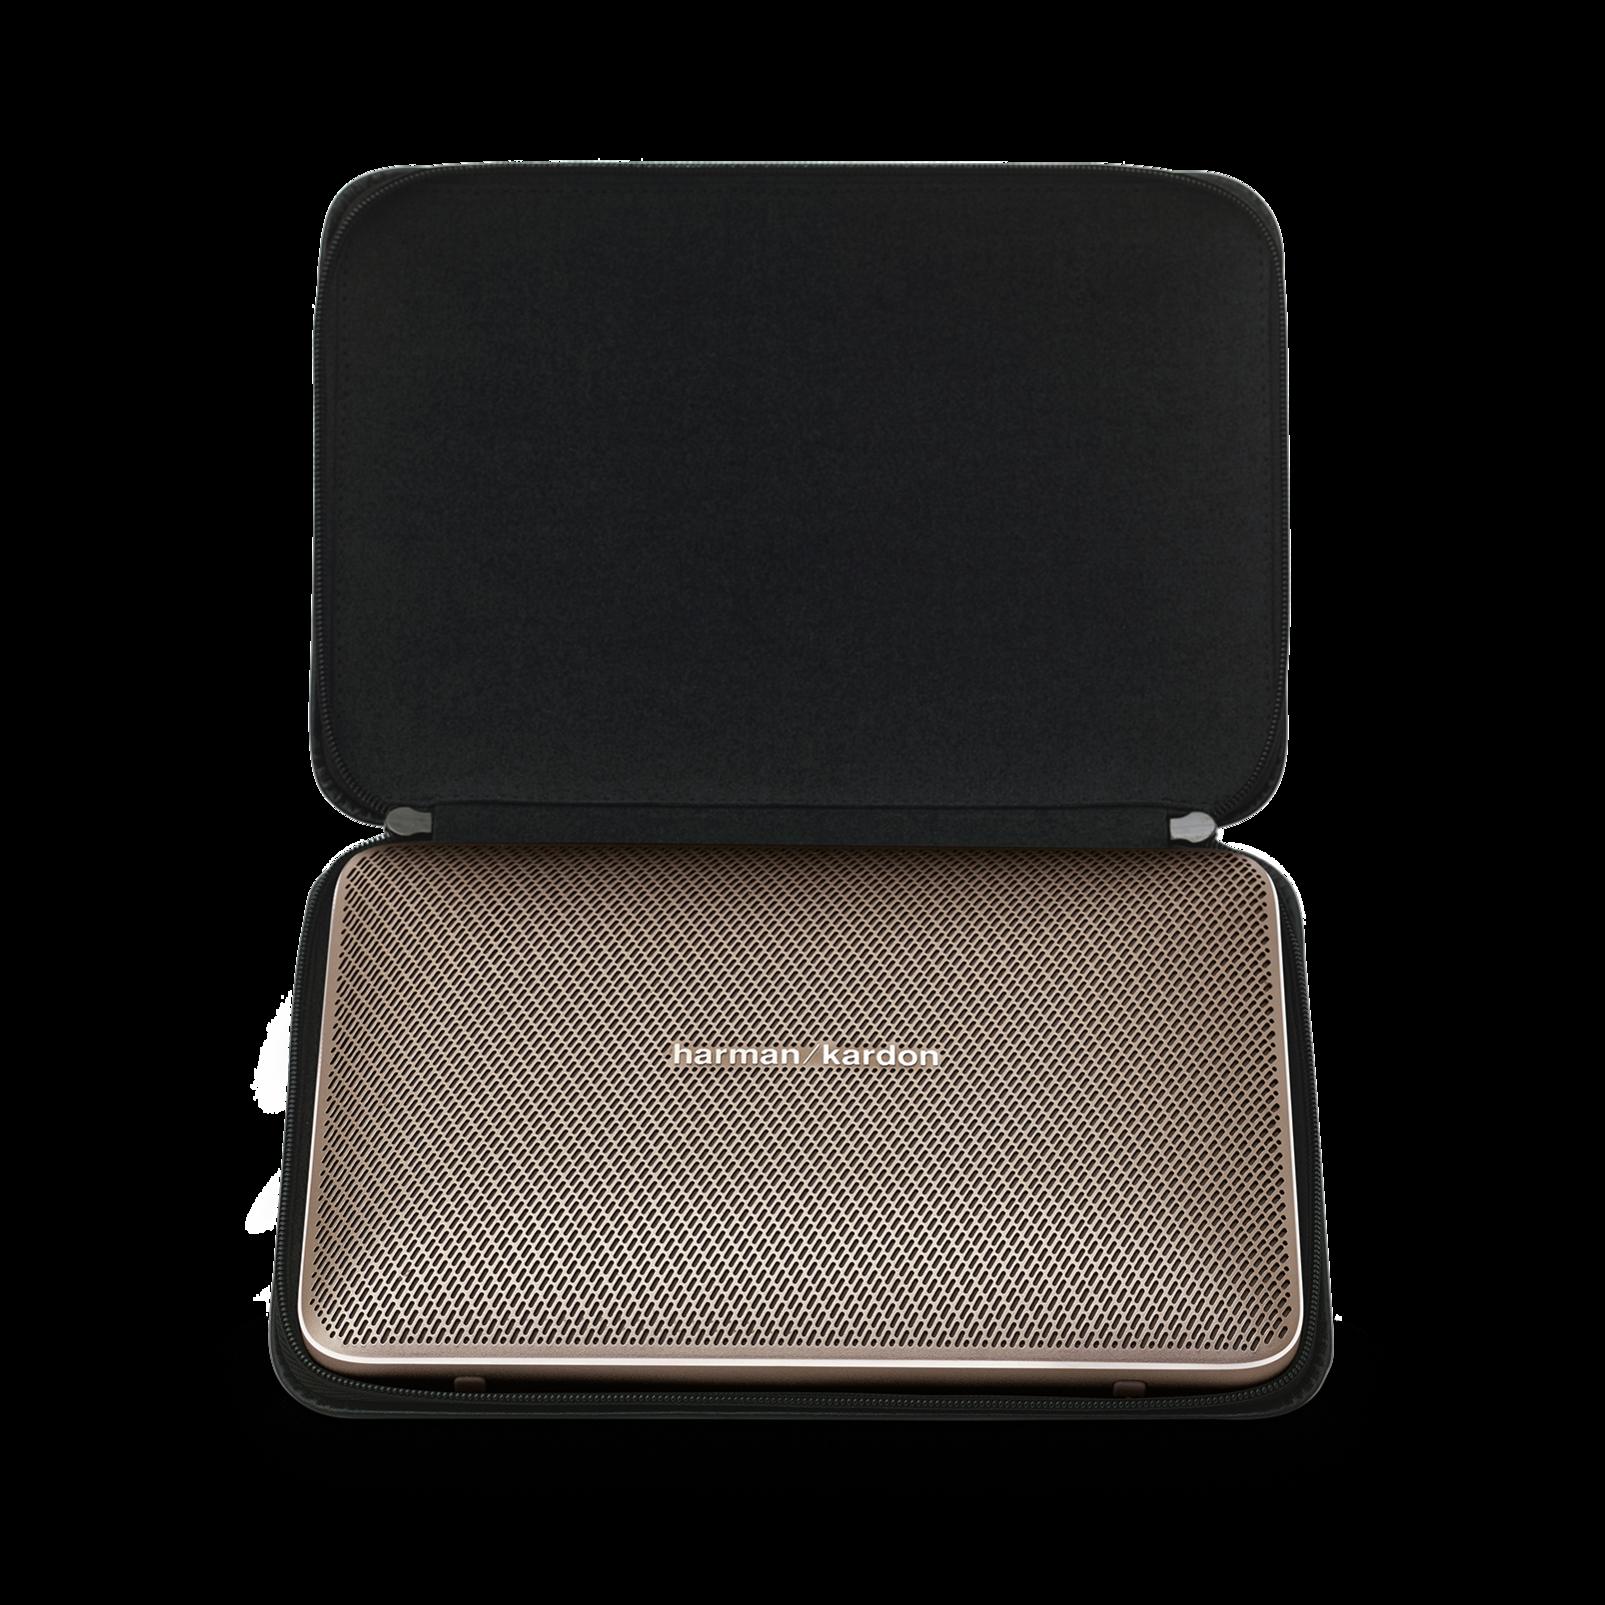 esquire 2 carrying case carrying case for harman kardon. Black Bedroom Furniture Sets. Home Design Ideas